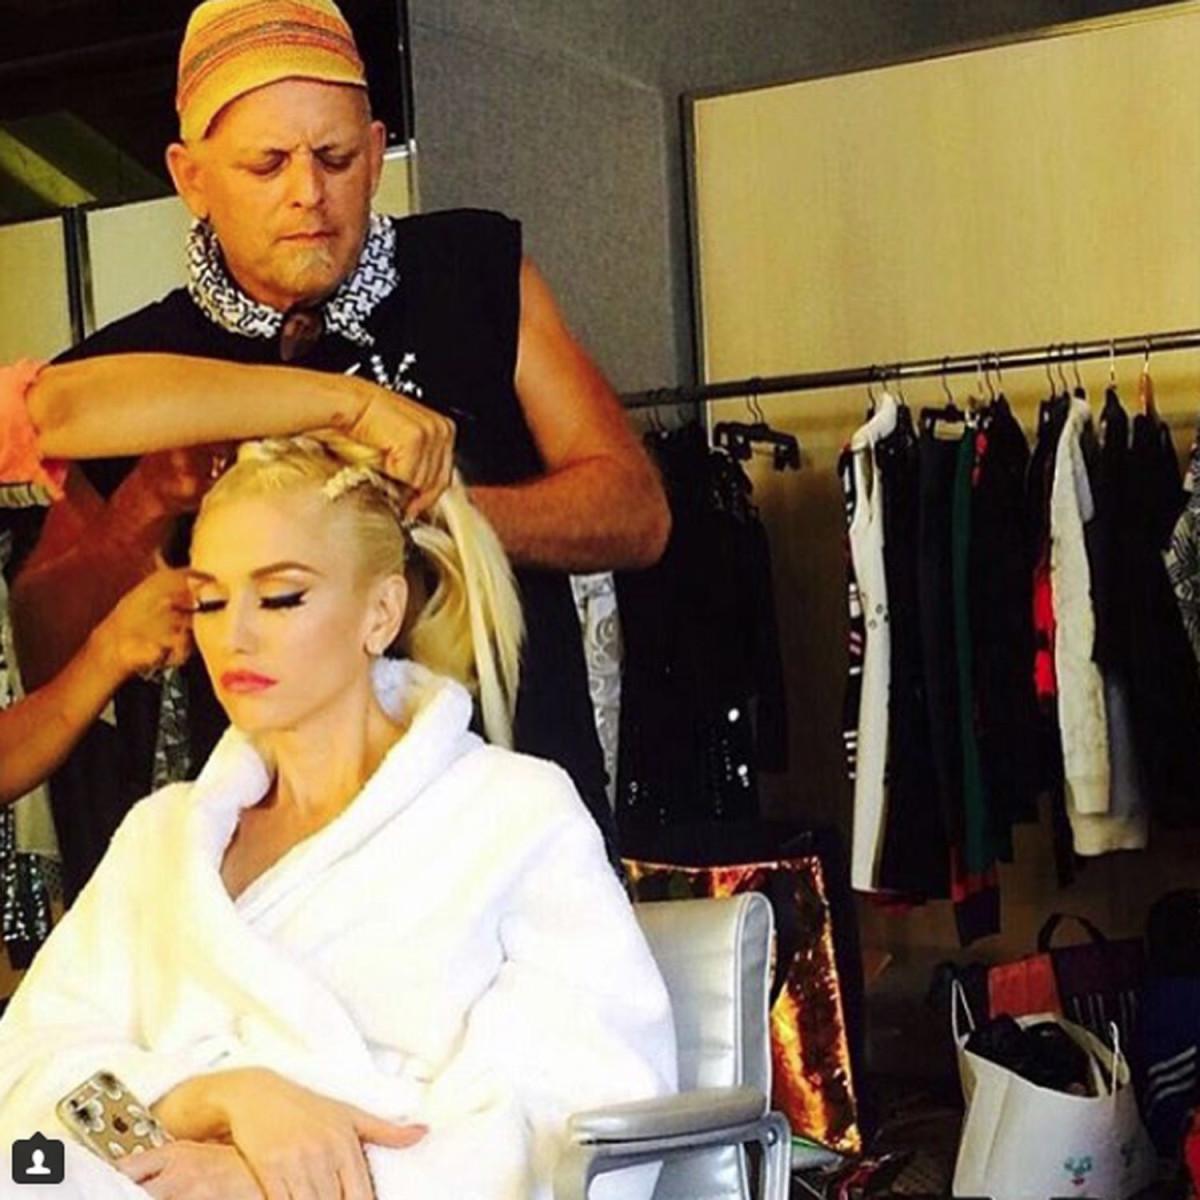 Danilo and Gwen Stefani